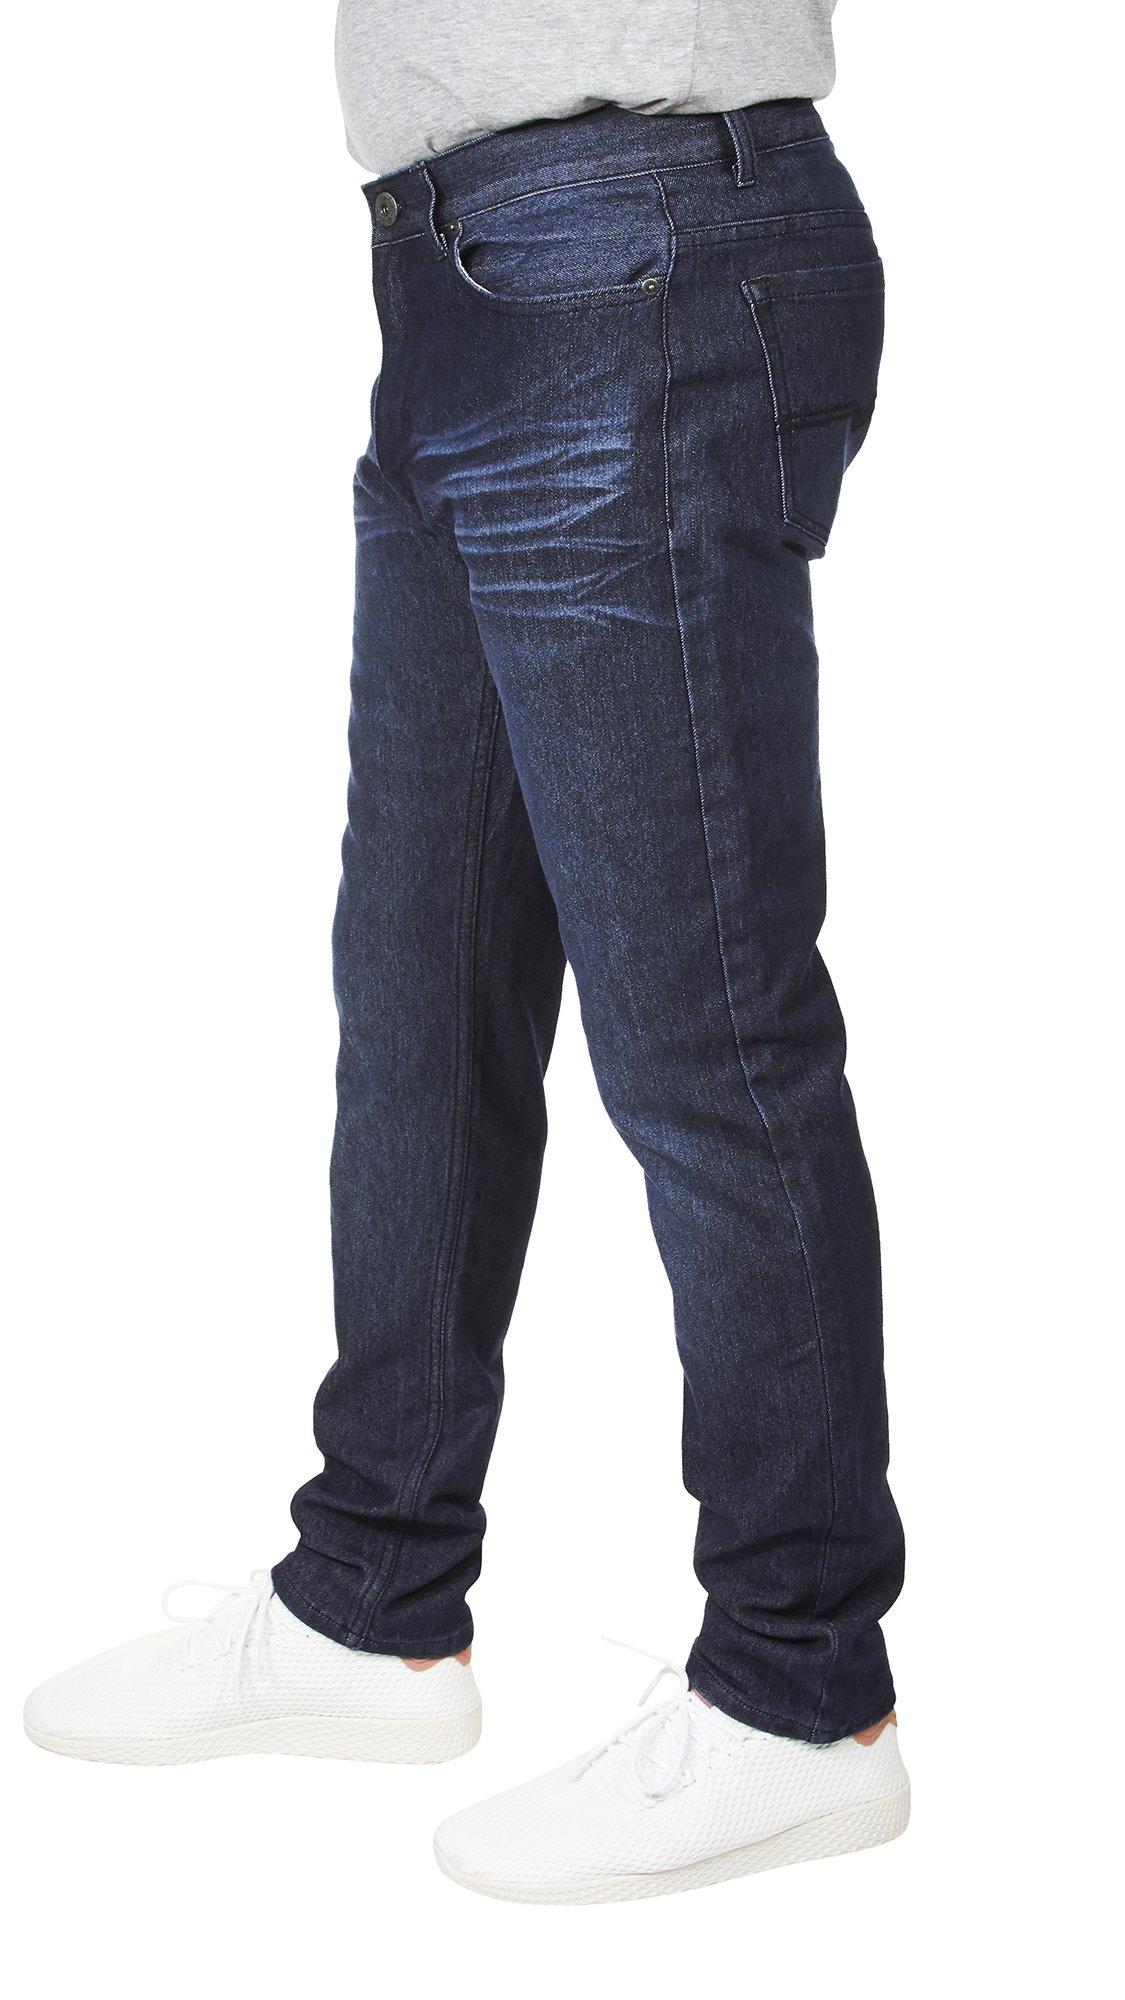 VINTAGE GENES 1899 Mens Stretch Slim Washed Denim Jeans Blue Wrinkle 36X32 by VINTAGE GENES (Image #2)